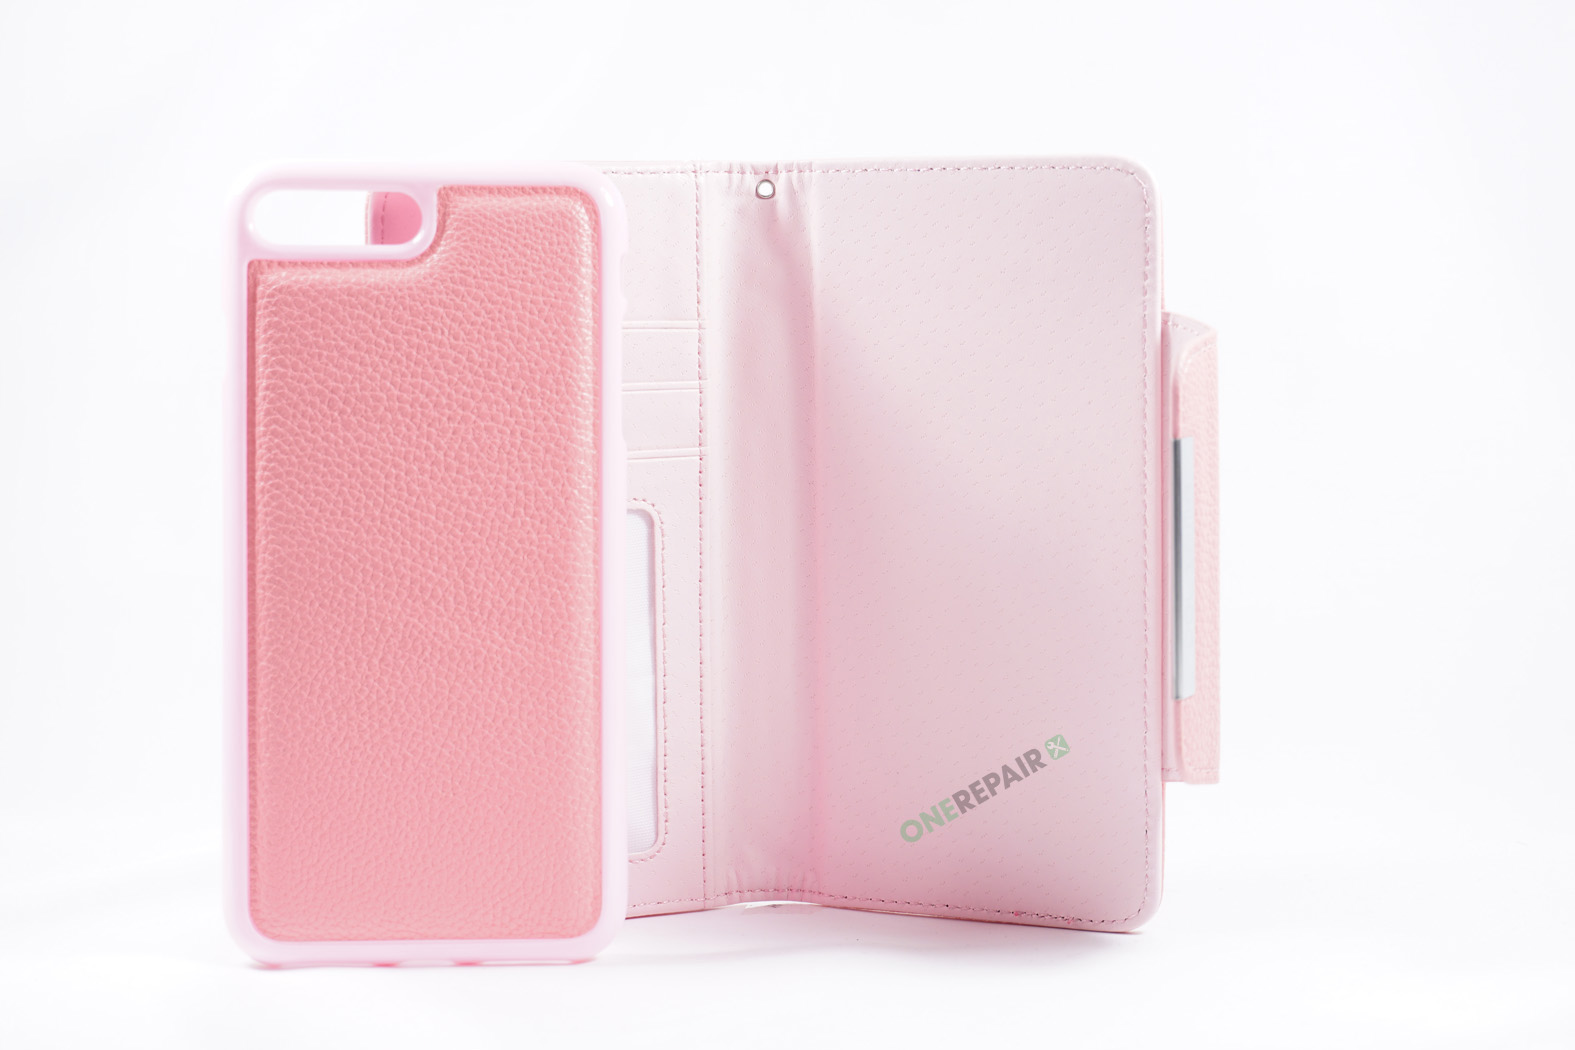 350852_iPhone_7+_8+_Plus_Flipcover_Magnet_Cover_Lyseroed_Pink_OneRepair_WM_00003